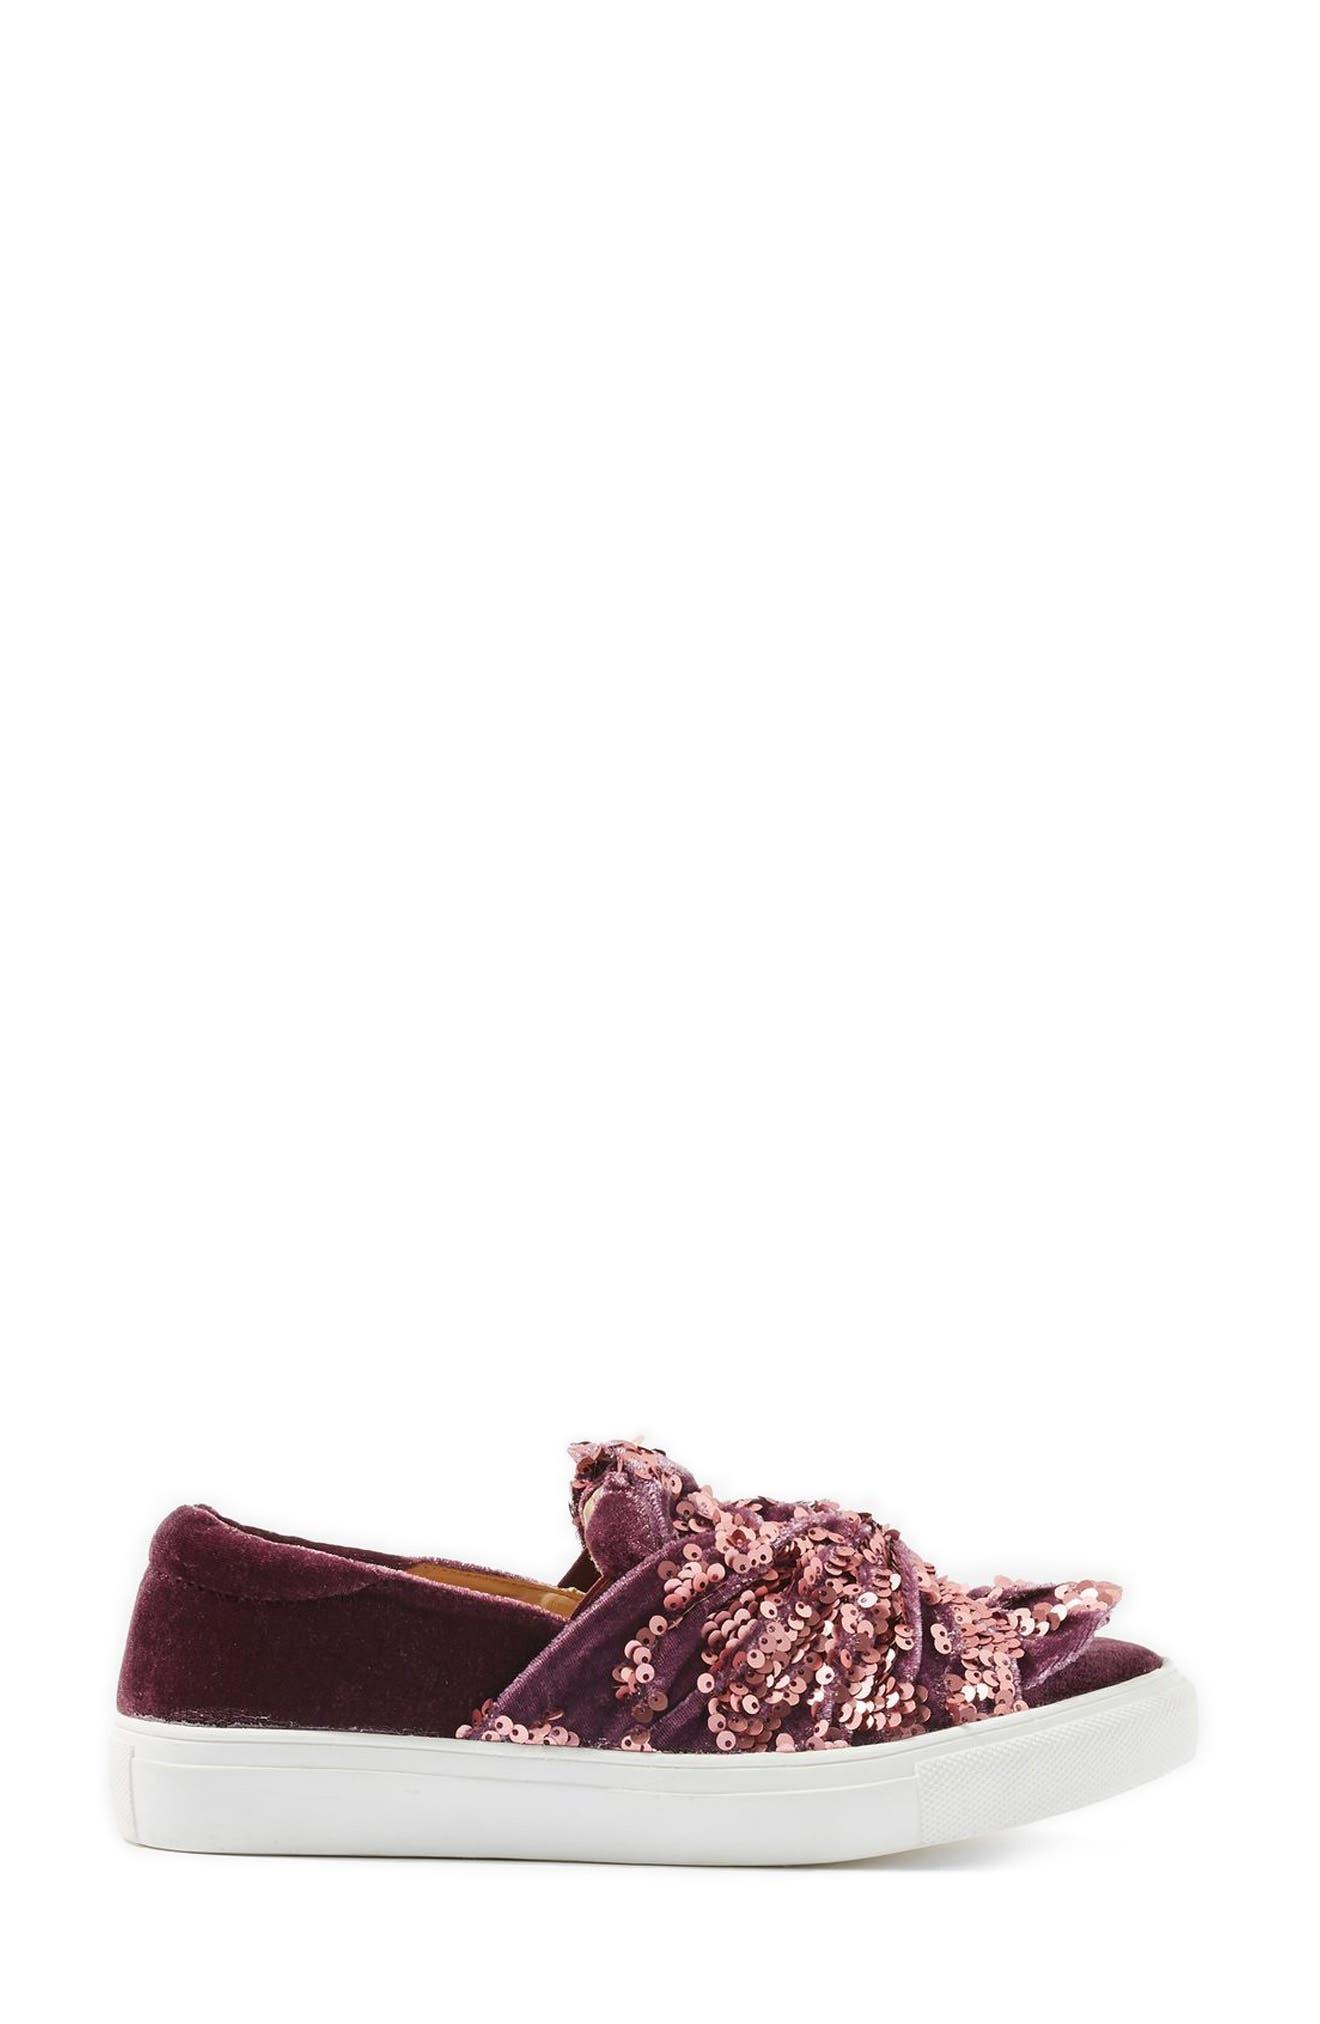 Alternate Image 2  - Topshop Twisted Sequin Velvet Sneakers